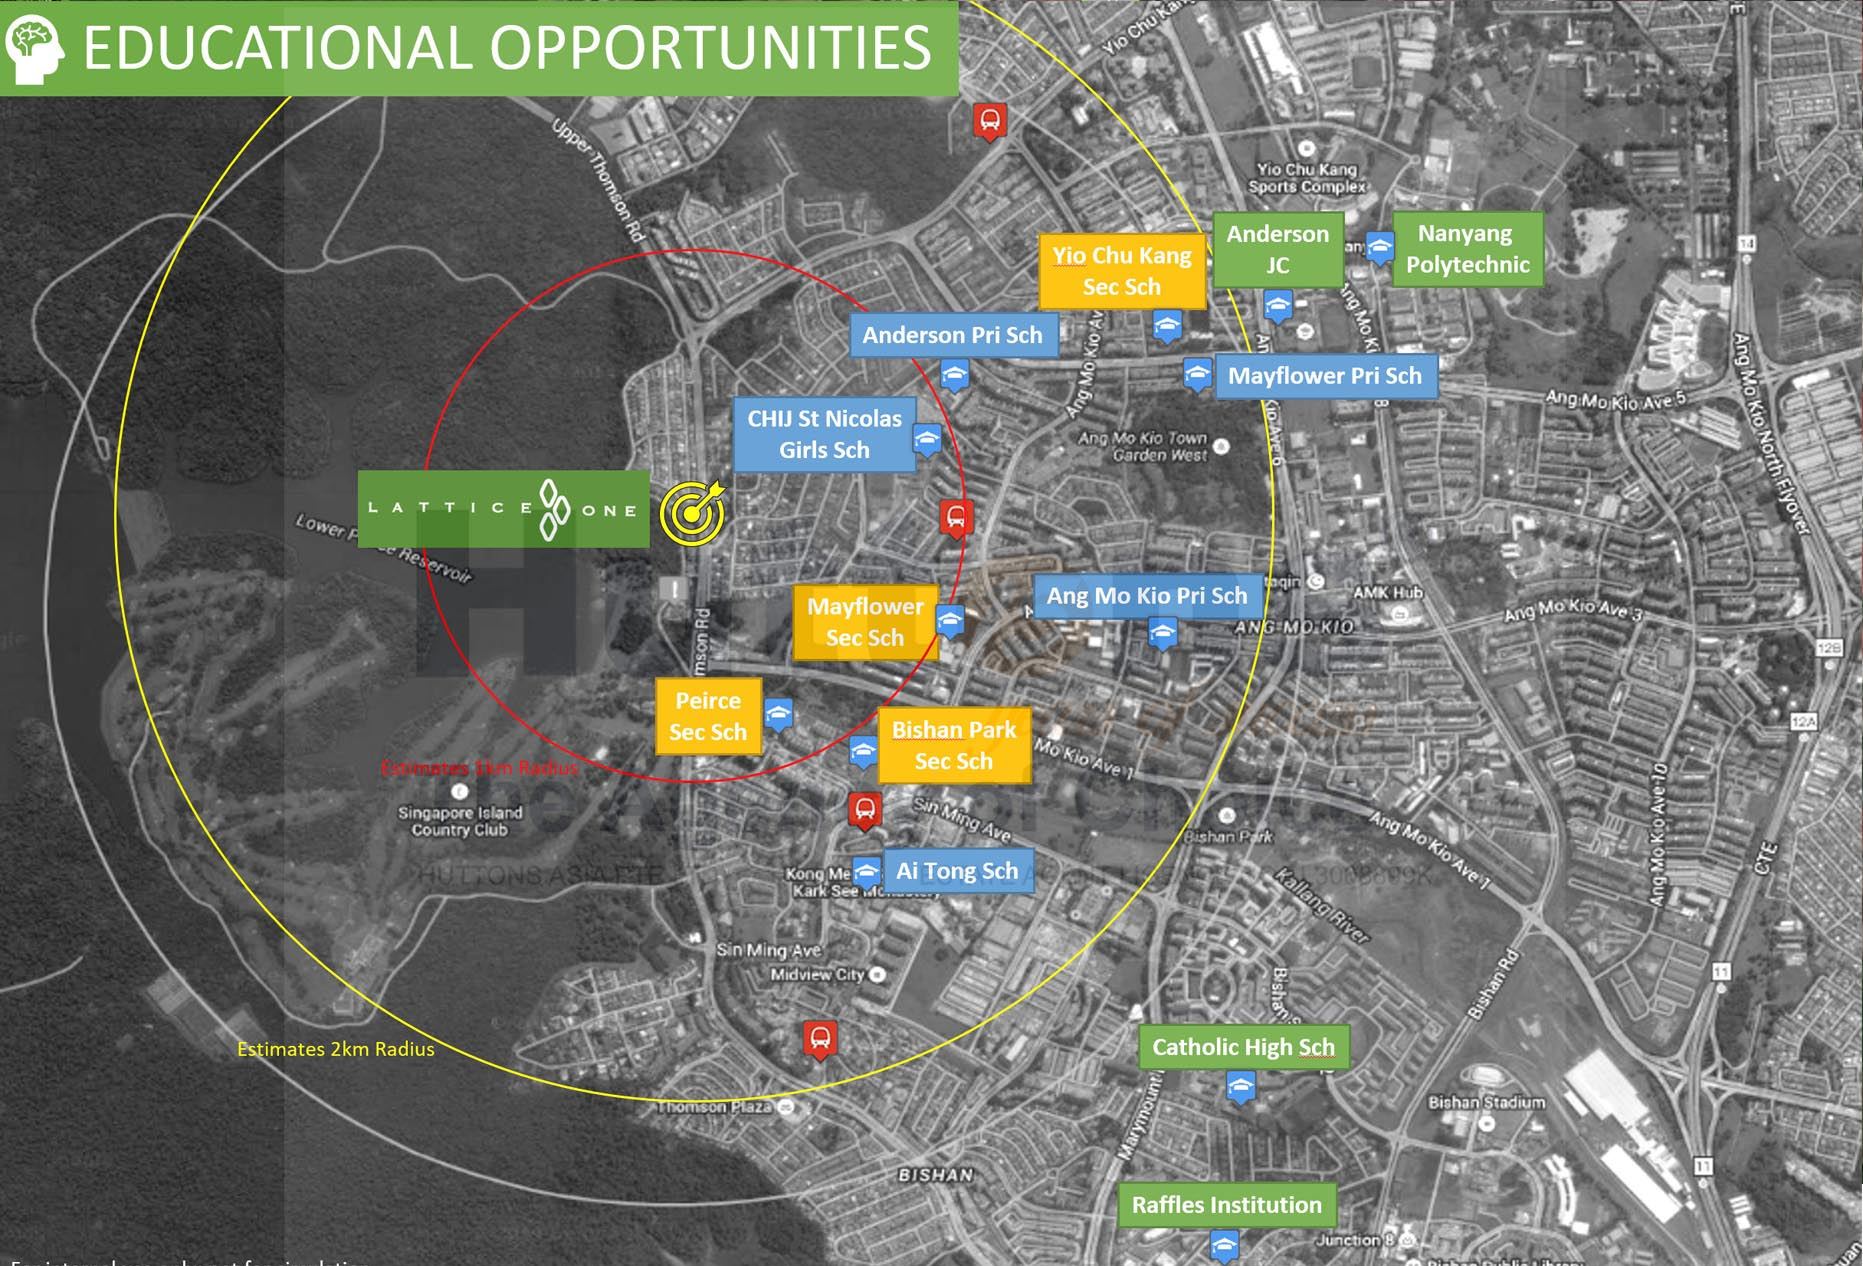 Lattice_One-education-opportunities